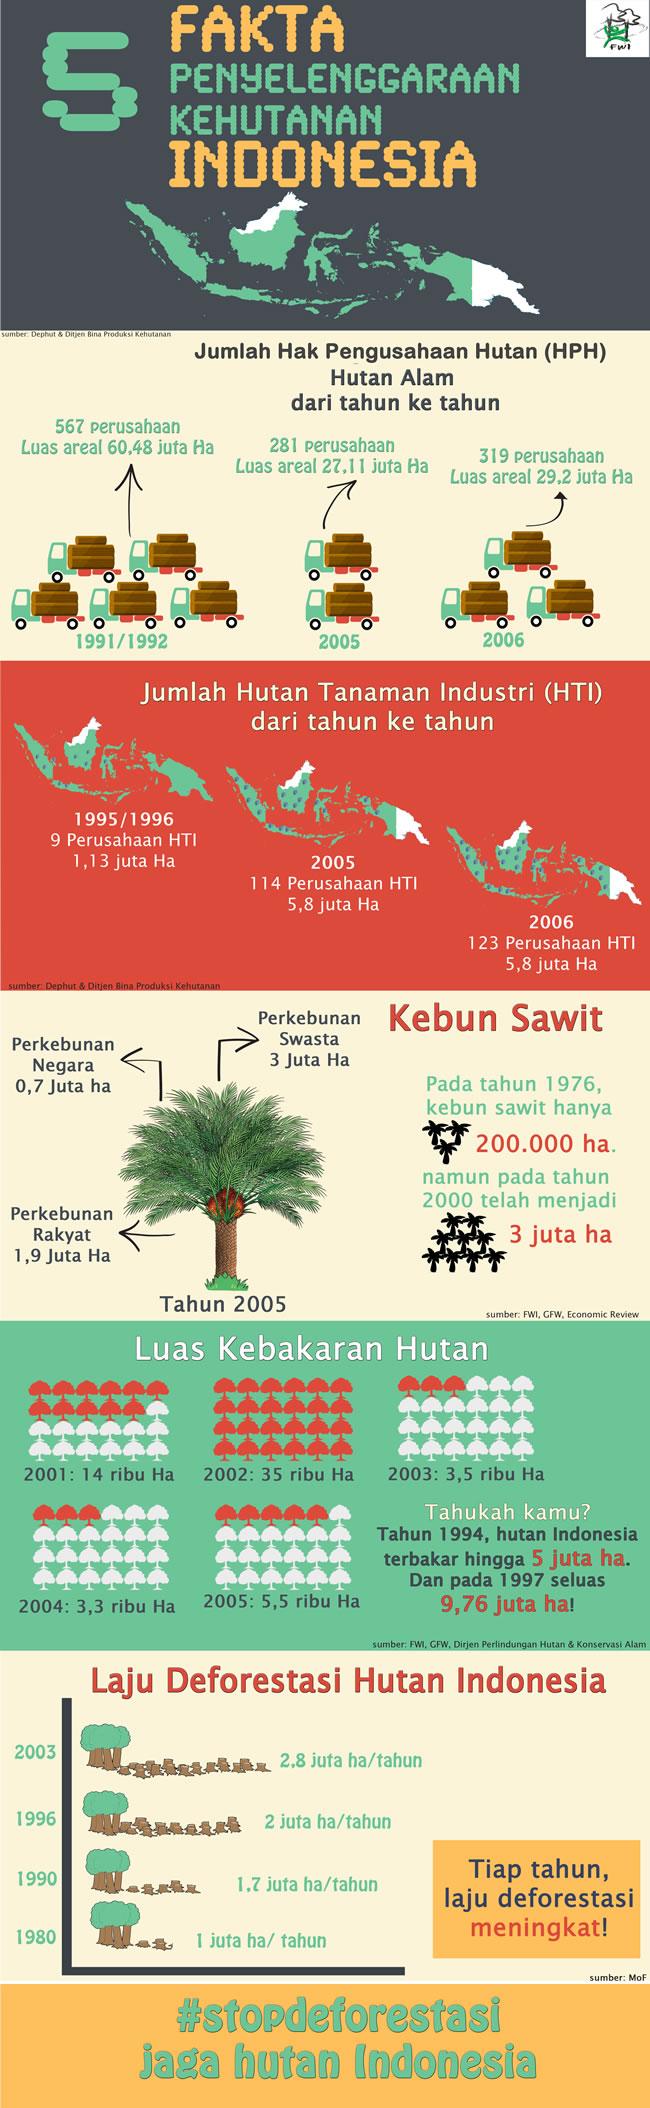 5_Fakta_Penyelenggaraan_Kehutanan_Indonesia_2005